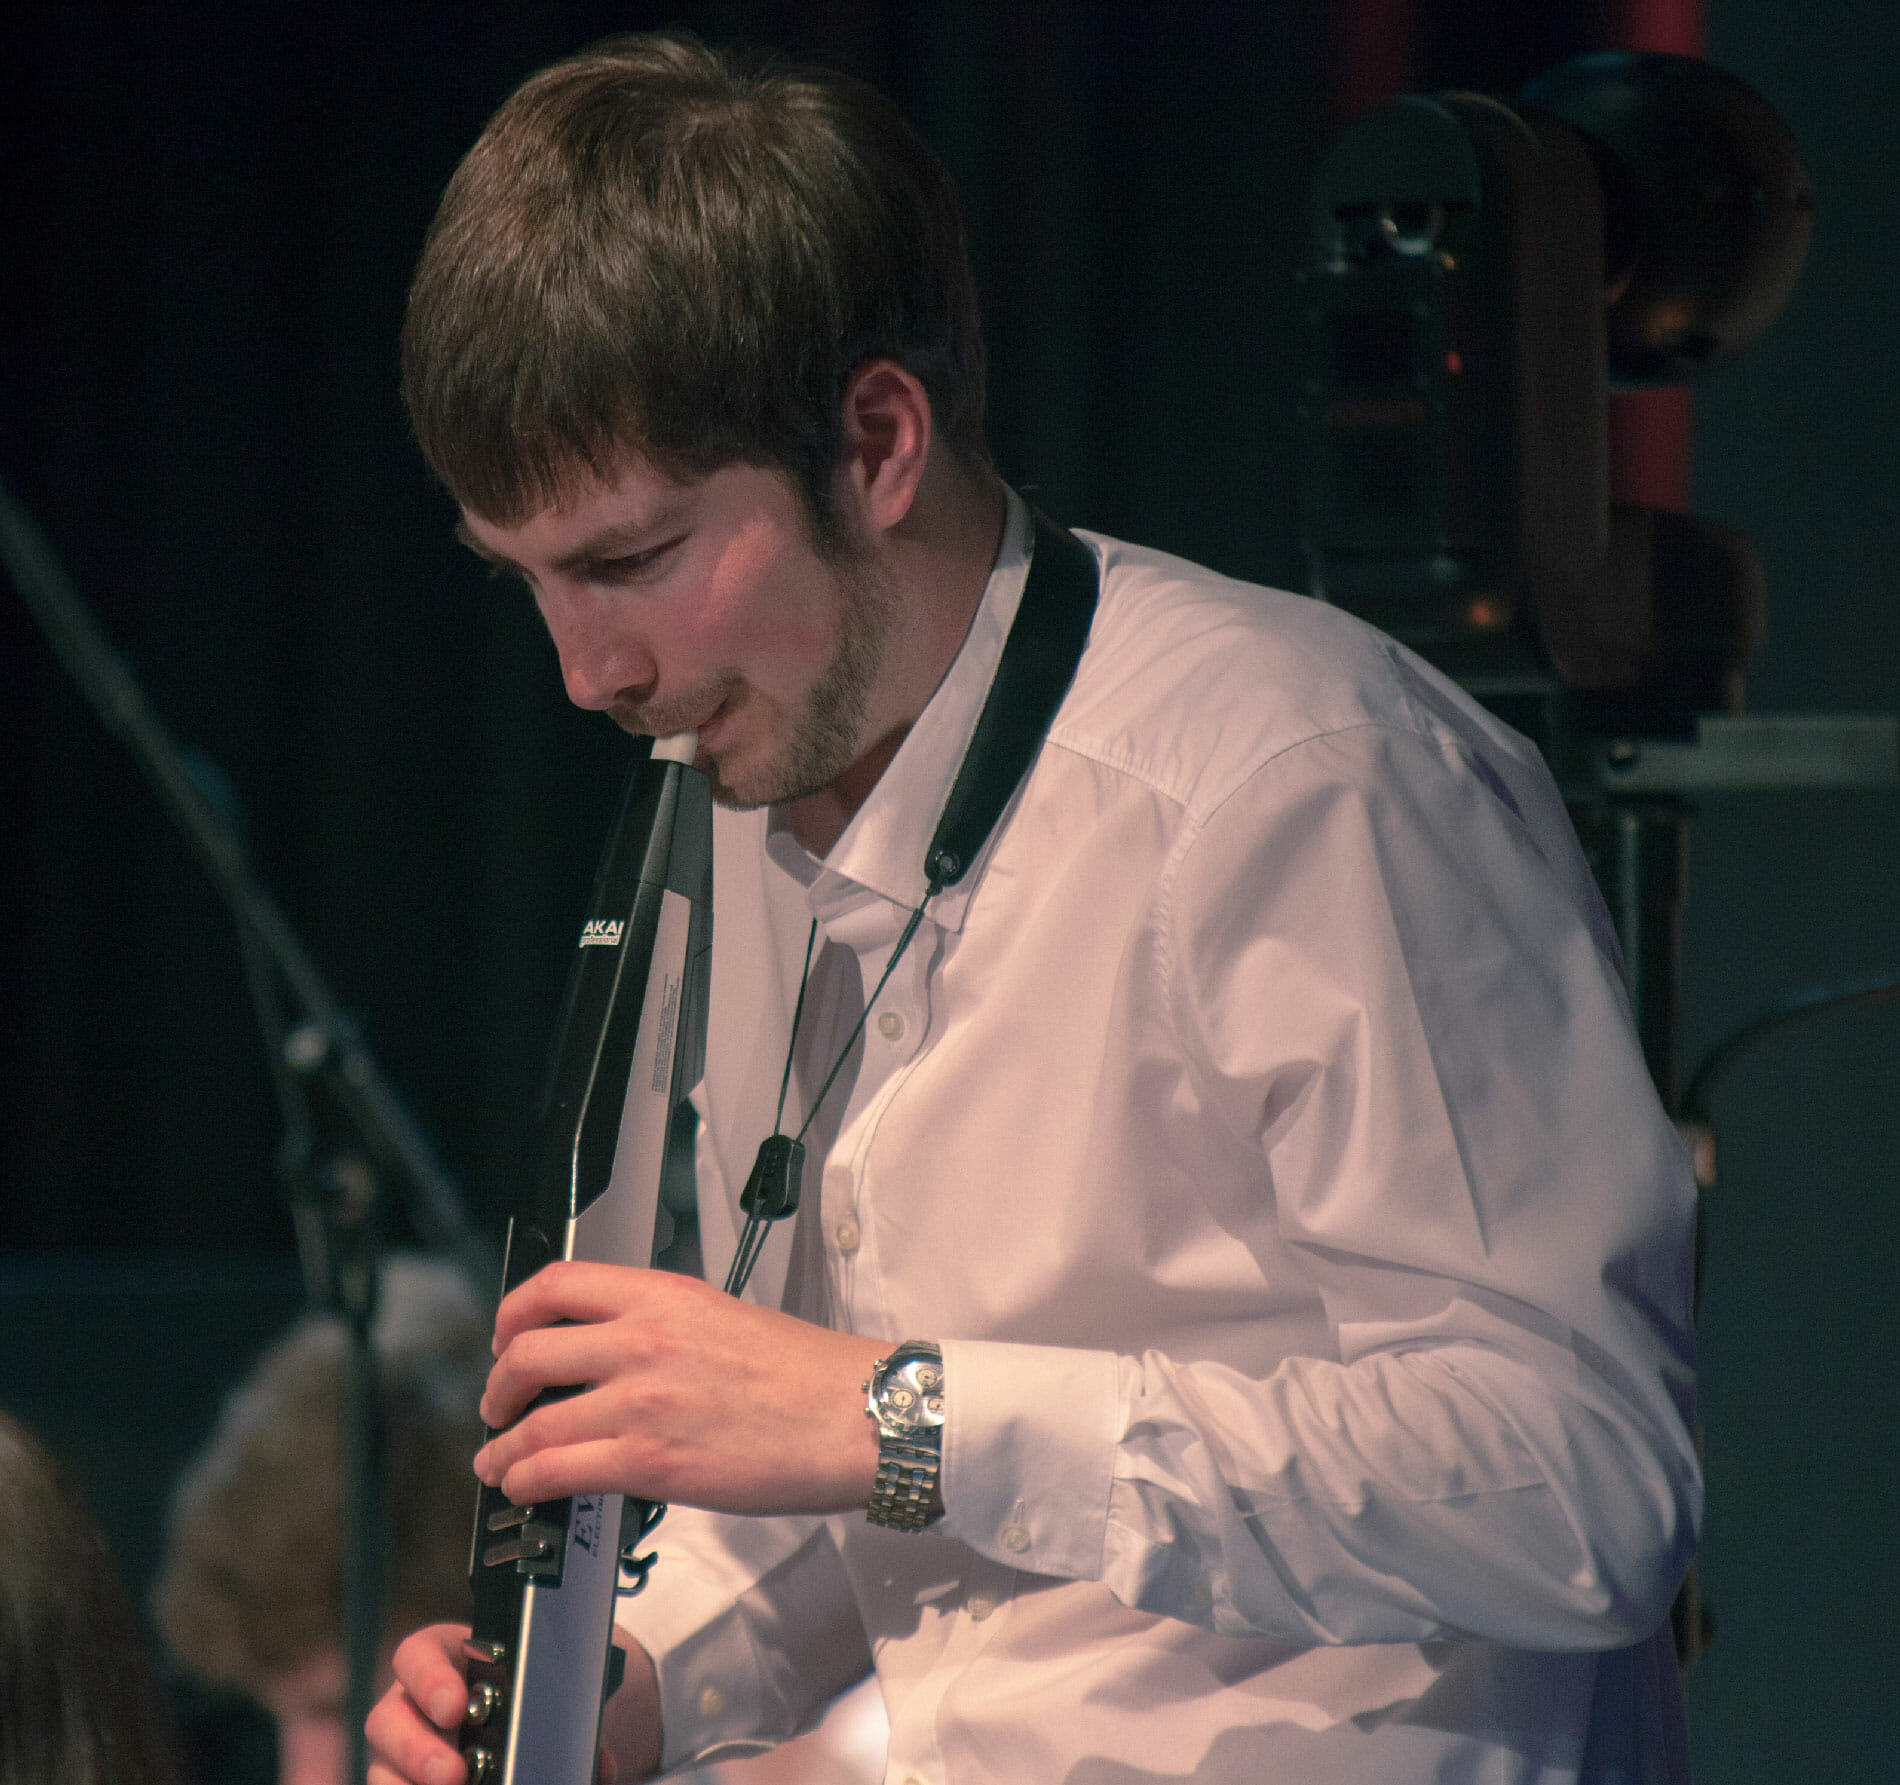 Felix Piringer